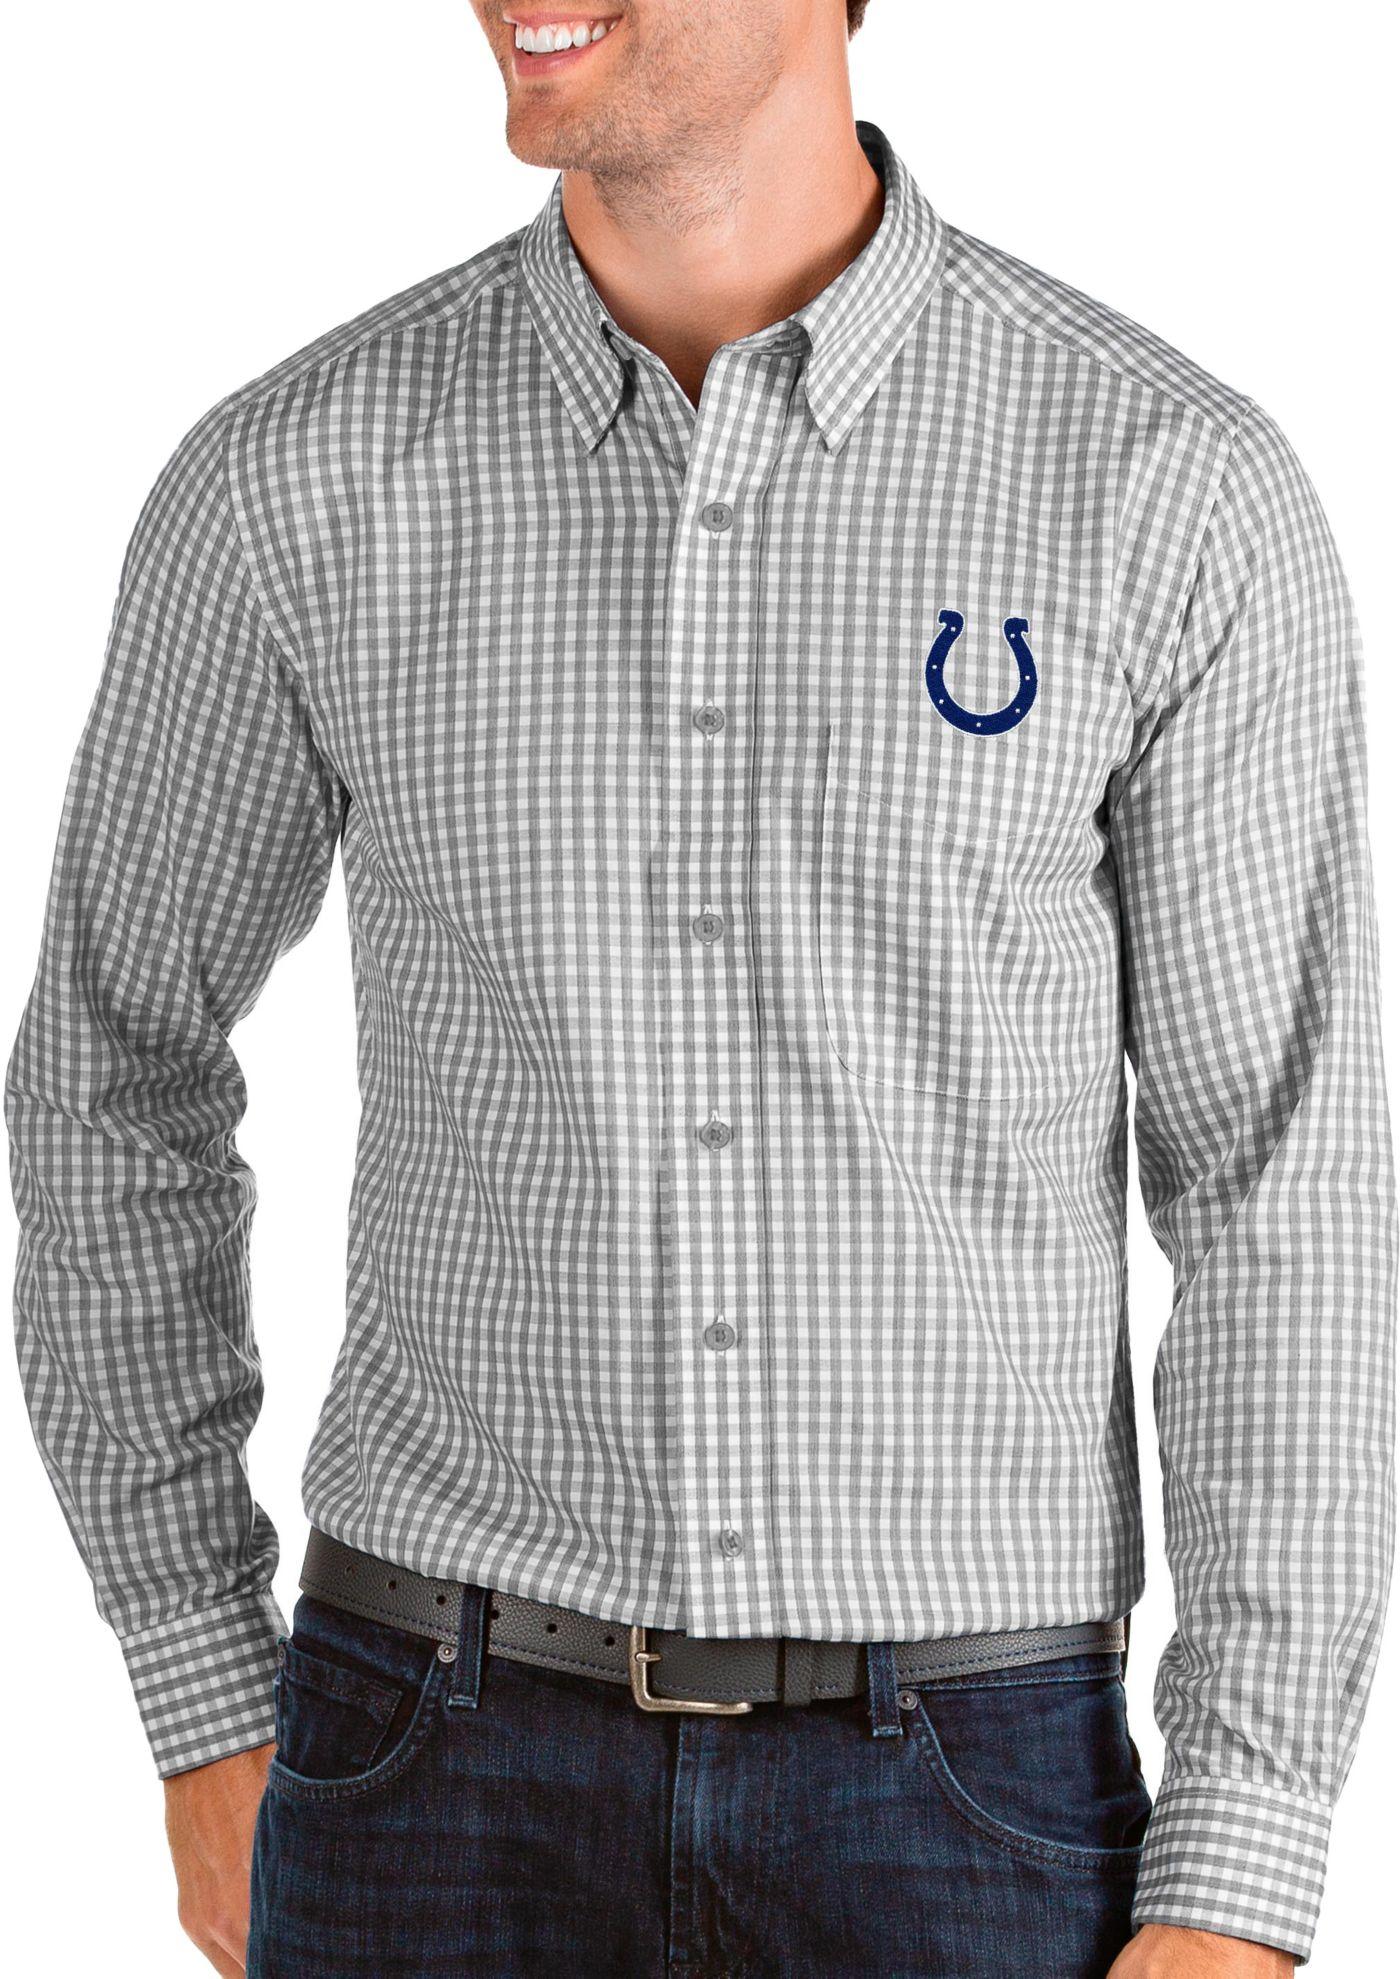 Antigua Men's Indianapolis Colts Structure Button Down Grey Dress Shirt